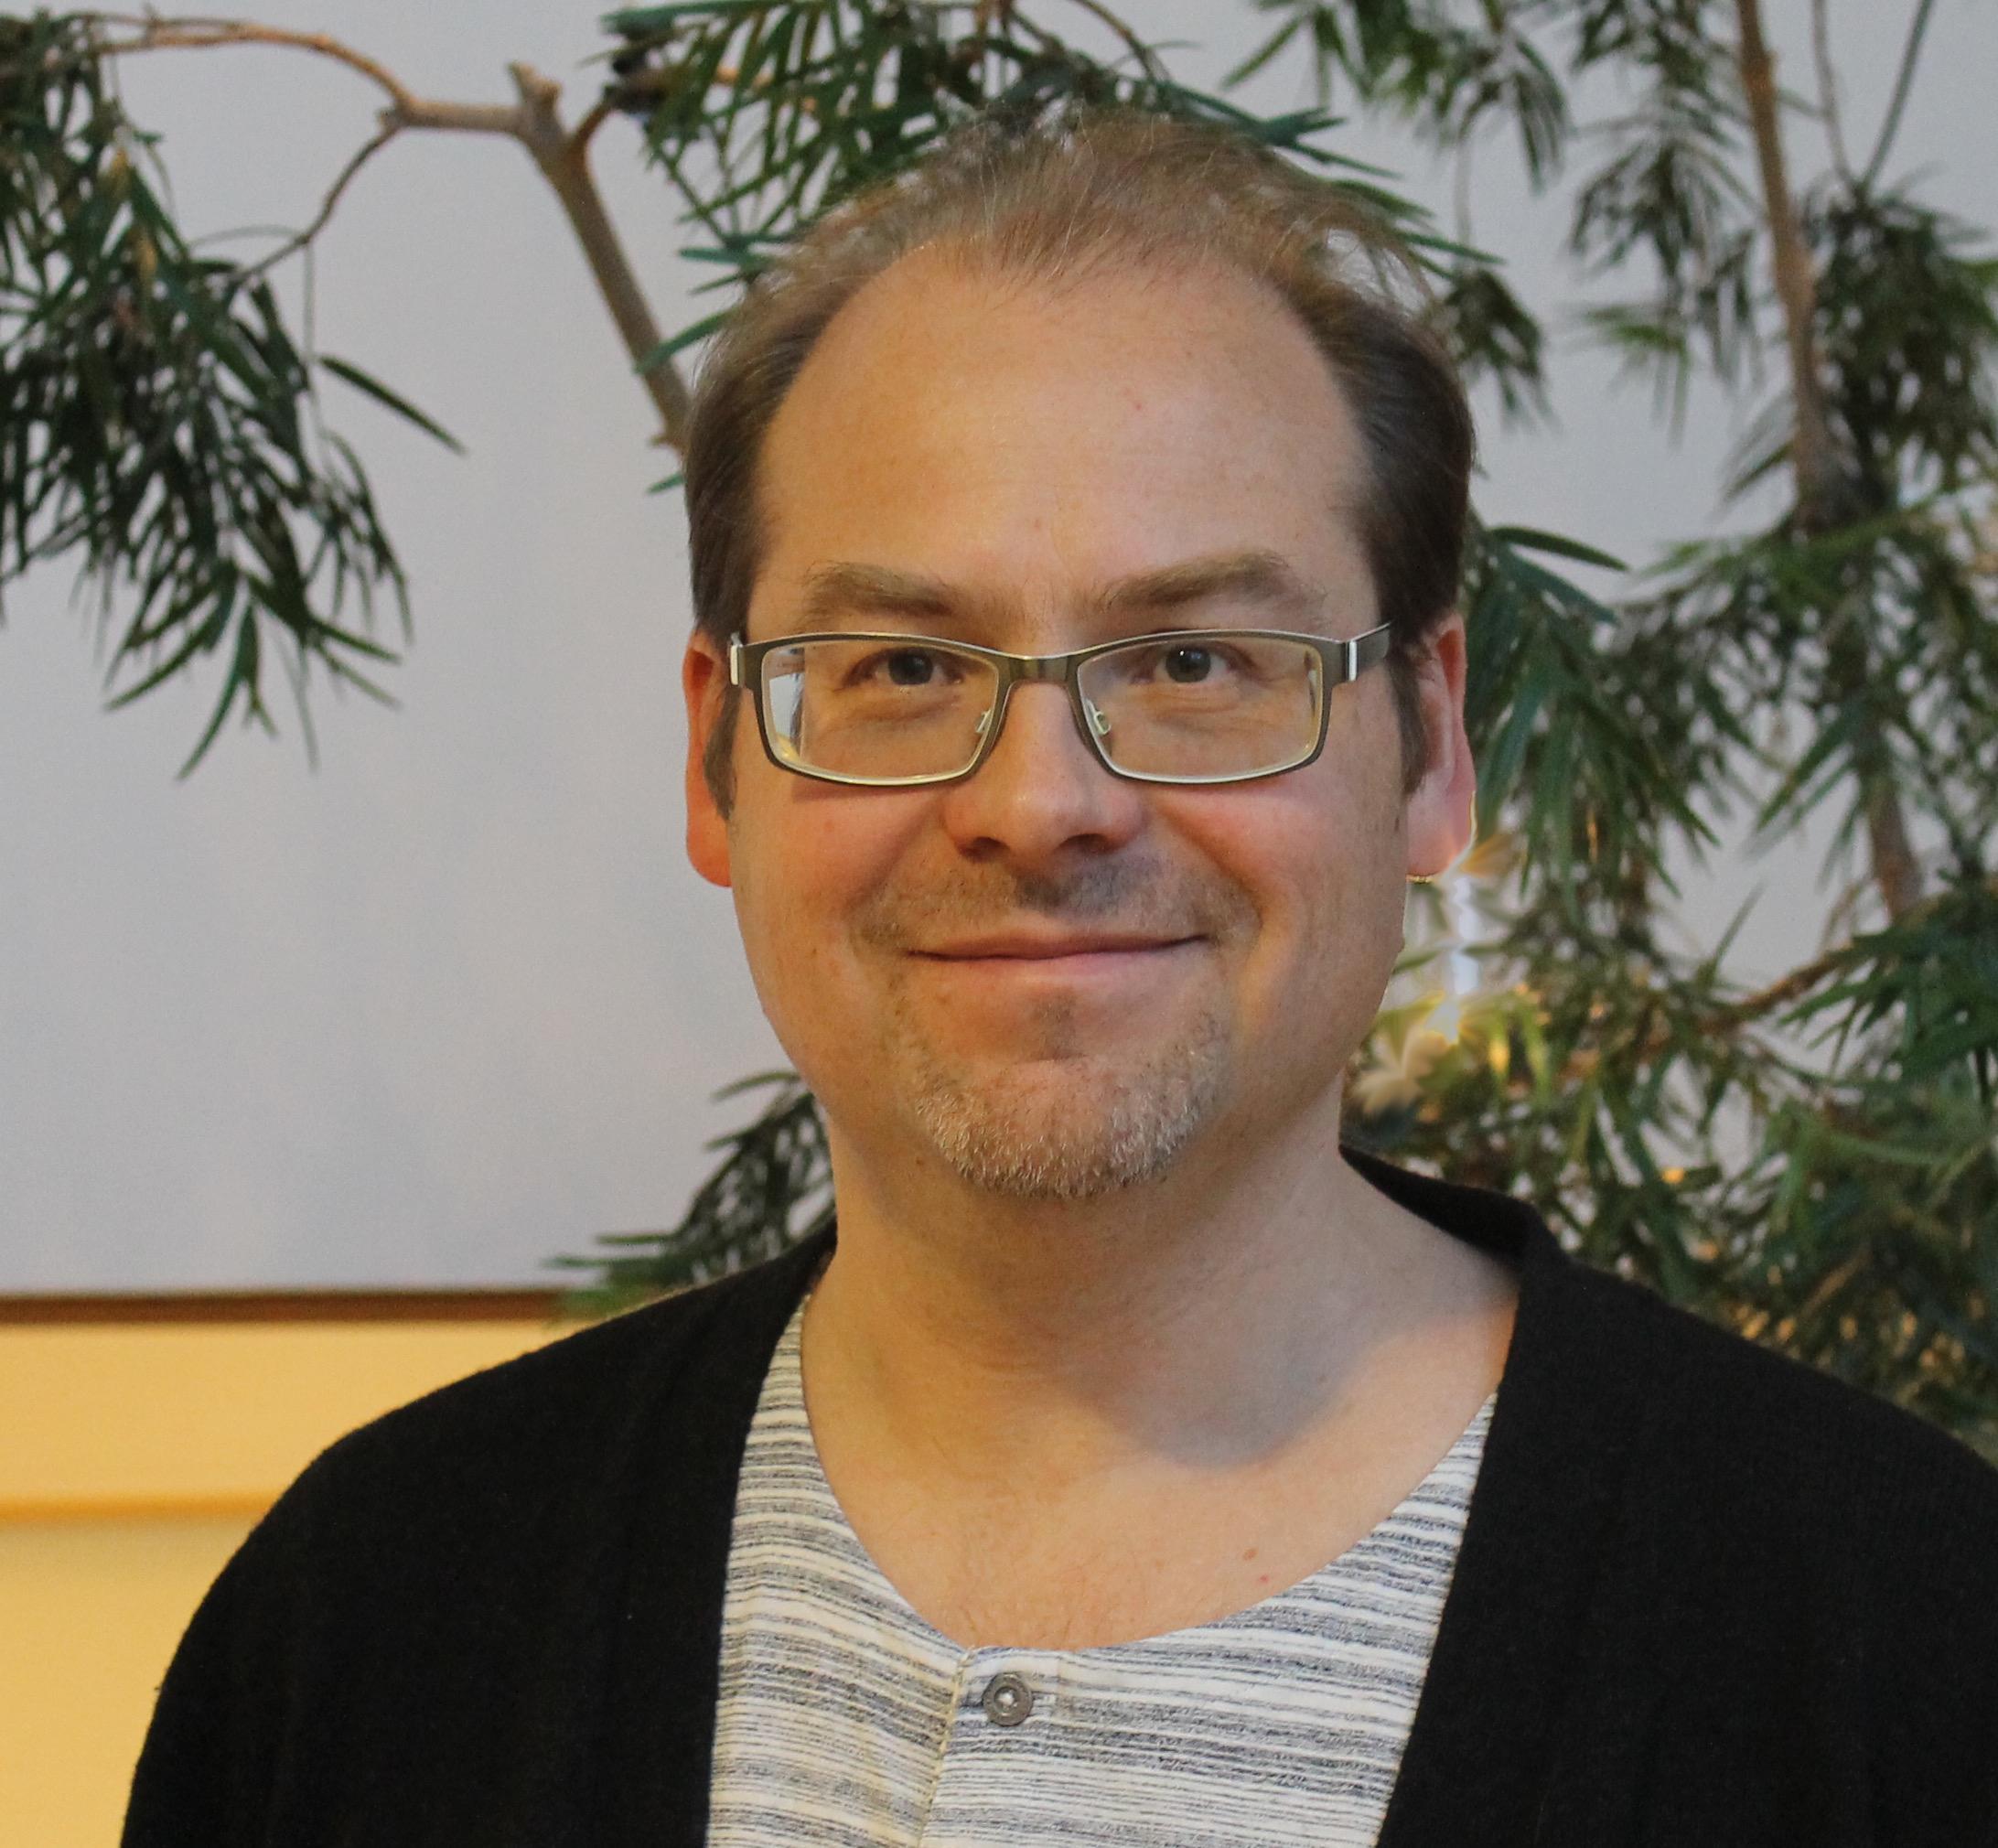 Örjan Pettersson